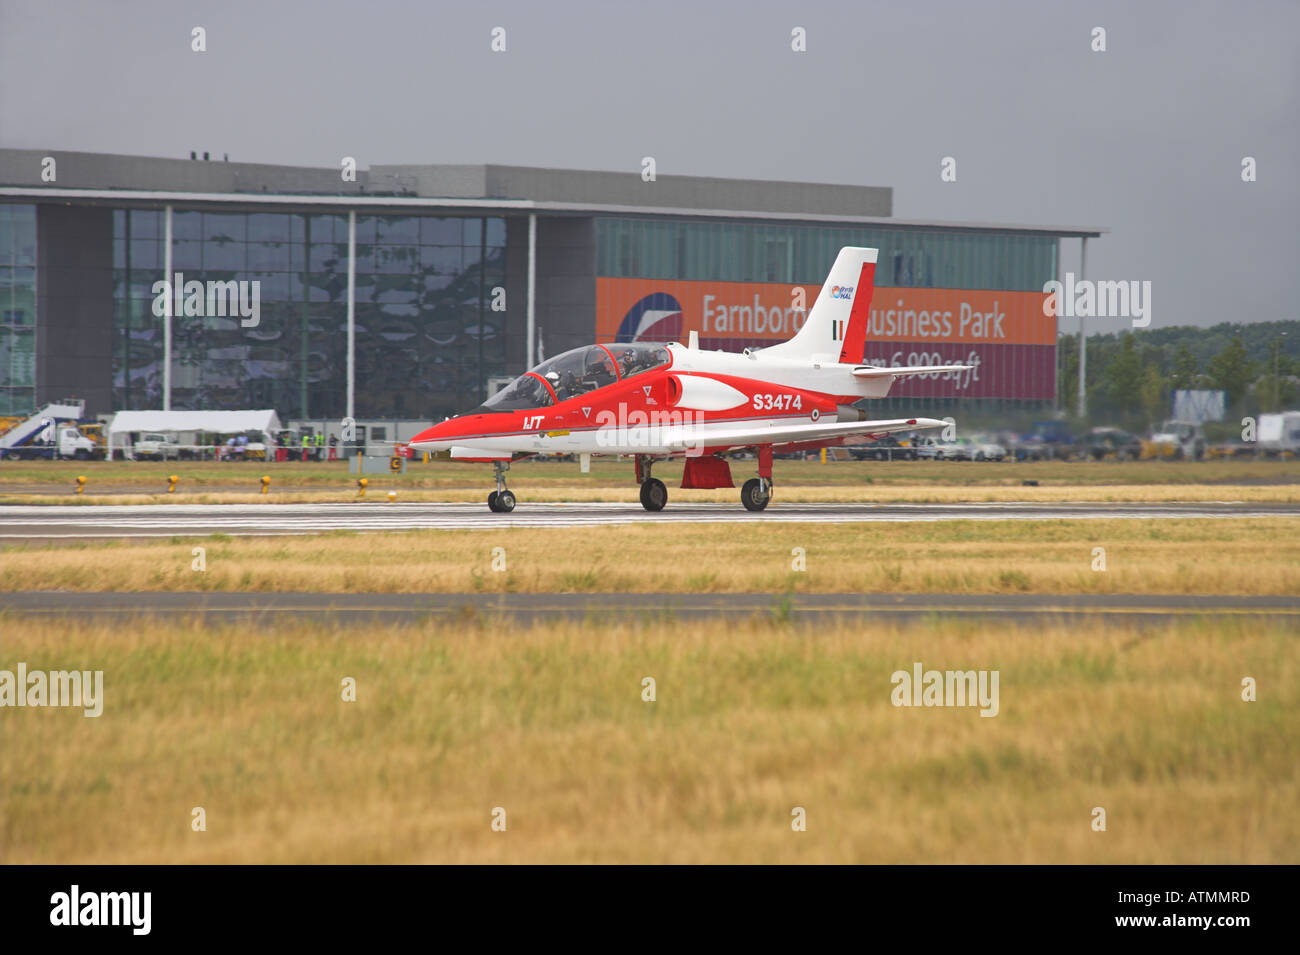 Hindustan Aeronautics Ltd IJT 36 Trainer ready to take off - Stock Image